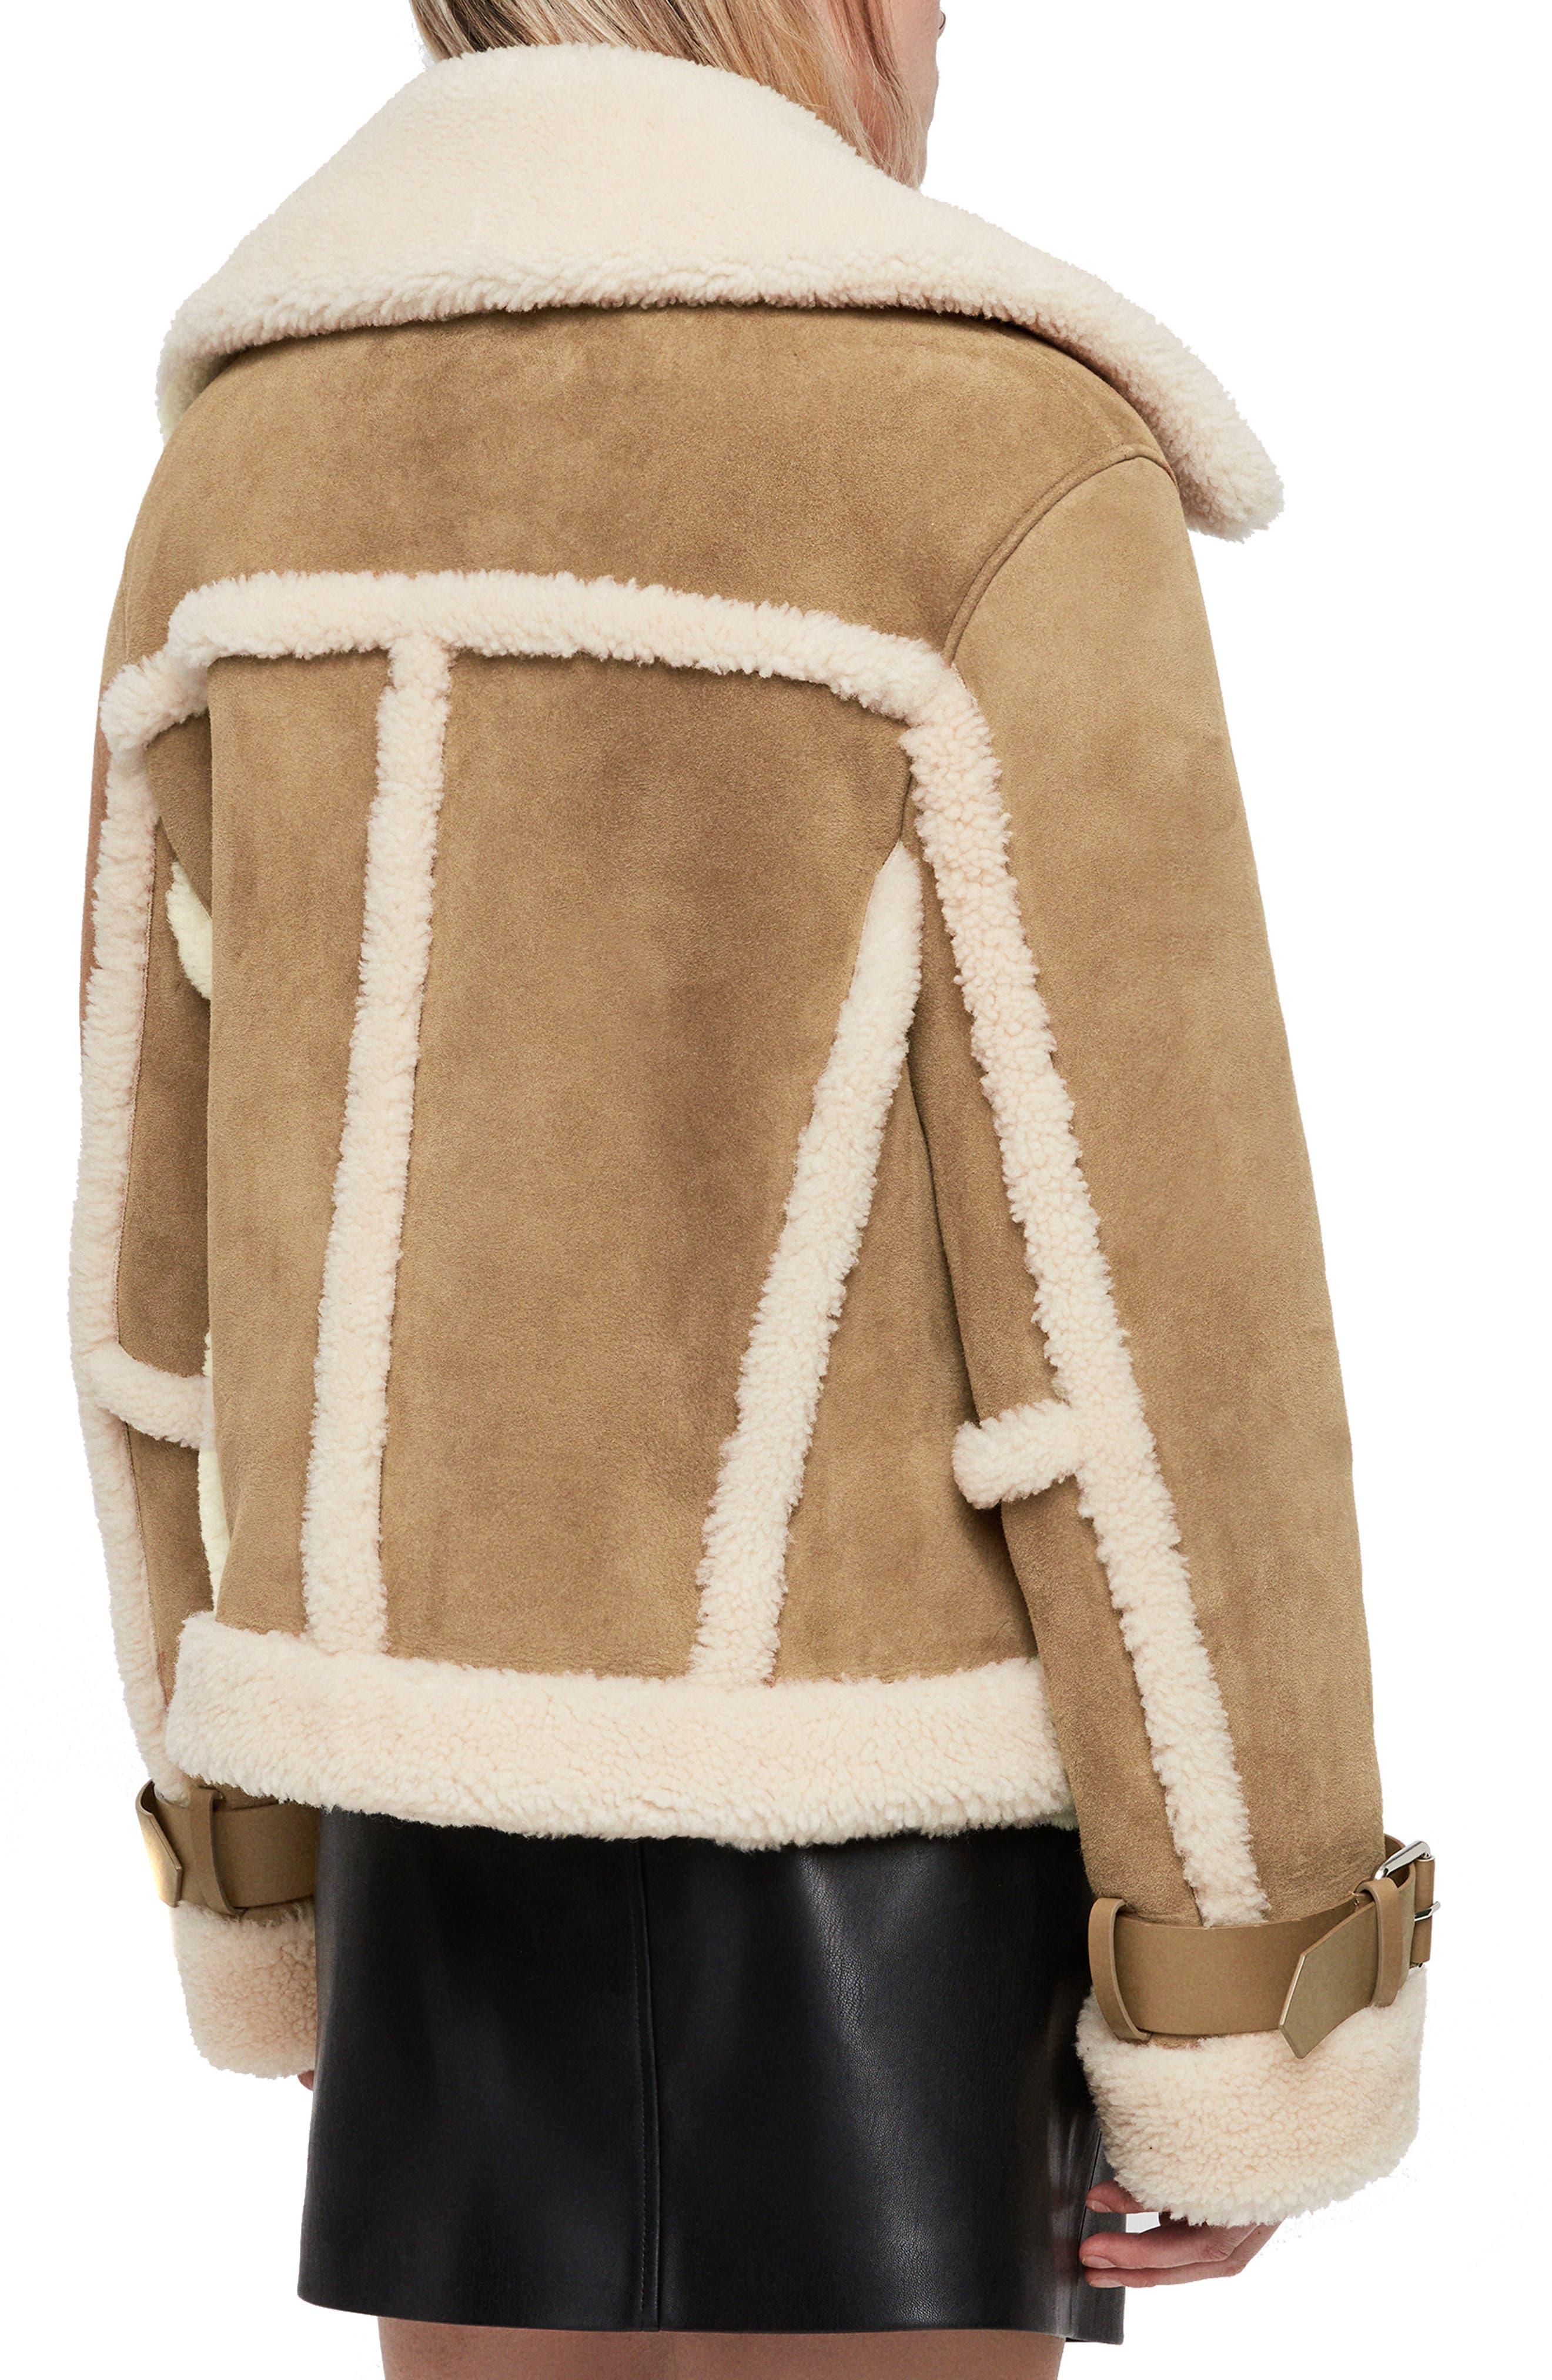 Farley Genuine Shearling Jacket,                             Alternate thumbnail 2, color,                             SAND BROWN/ ECRU